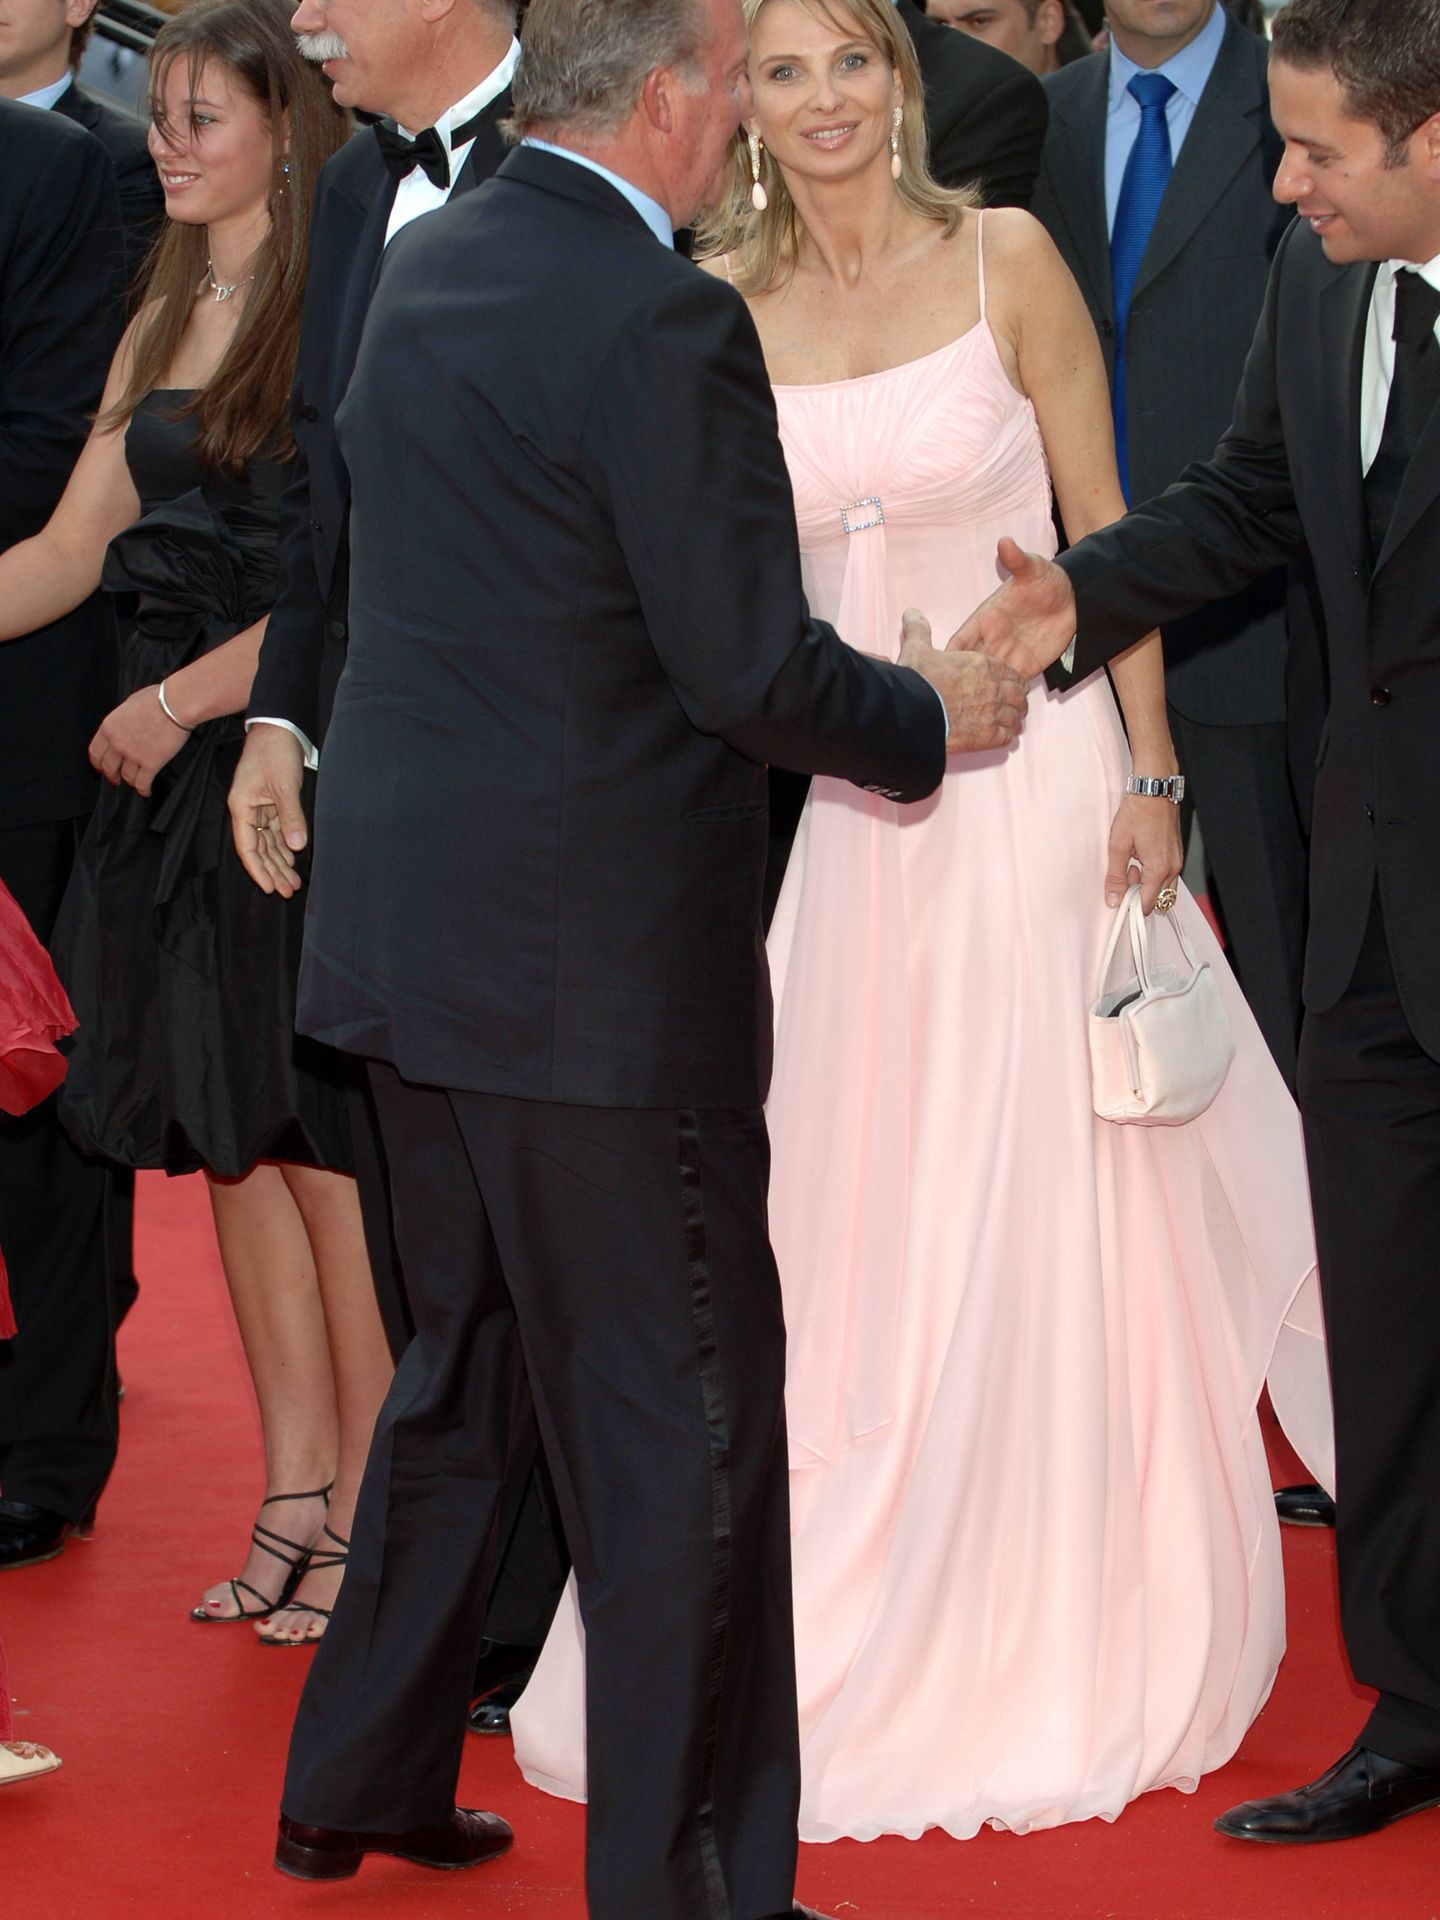 El rey Juan Carlos, junto a Corinna Zu Sayn-Wittgenstein en 2006. (Getty)